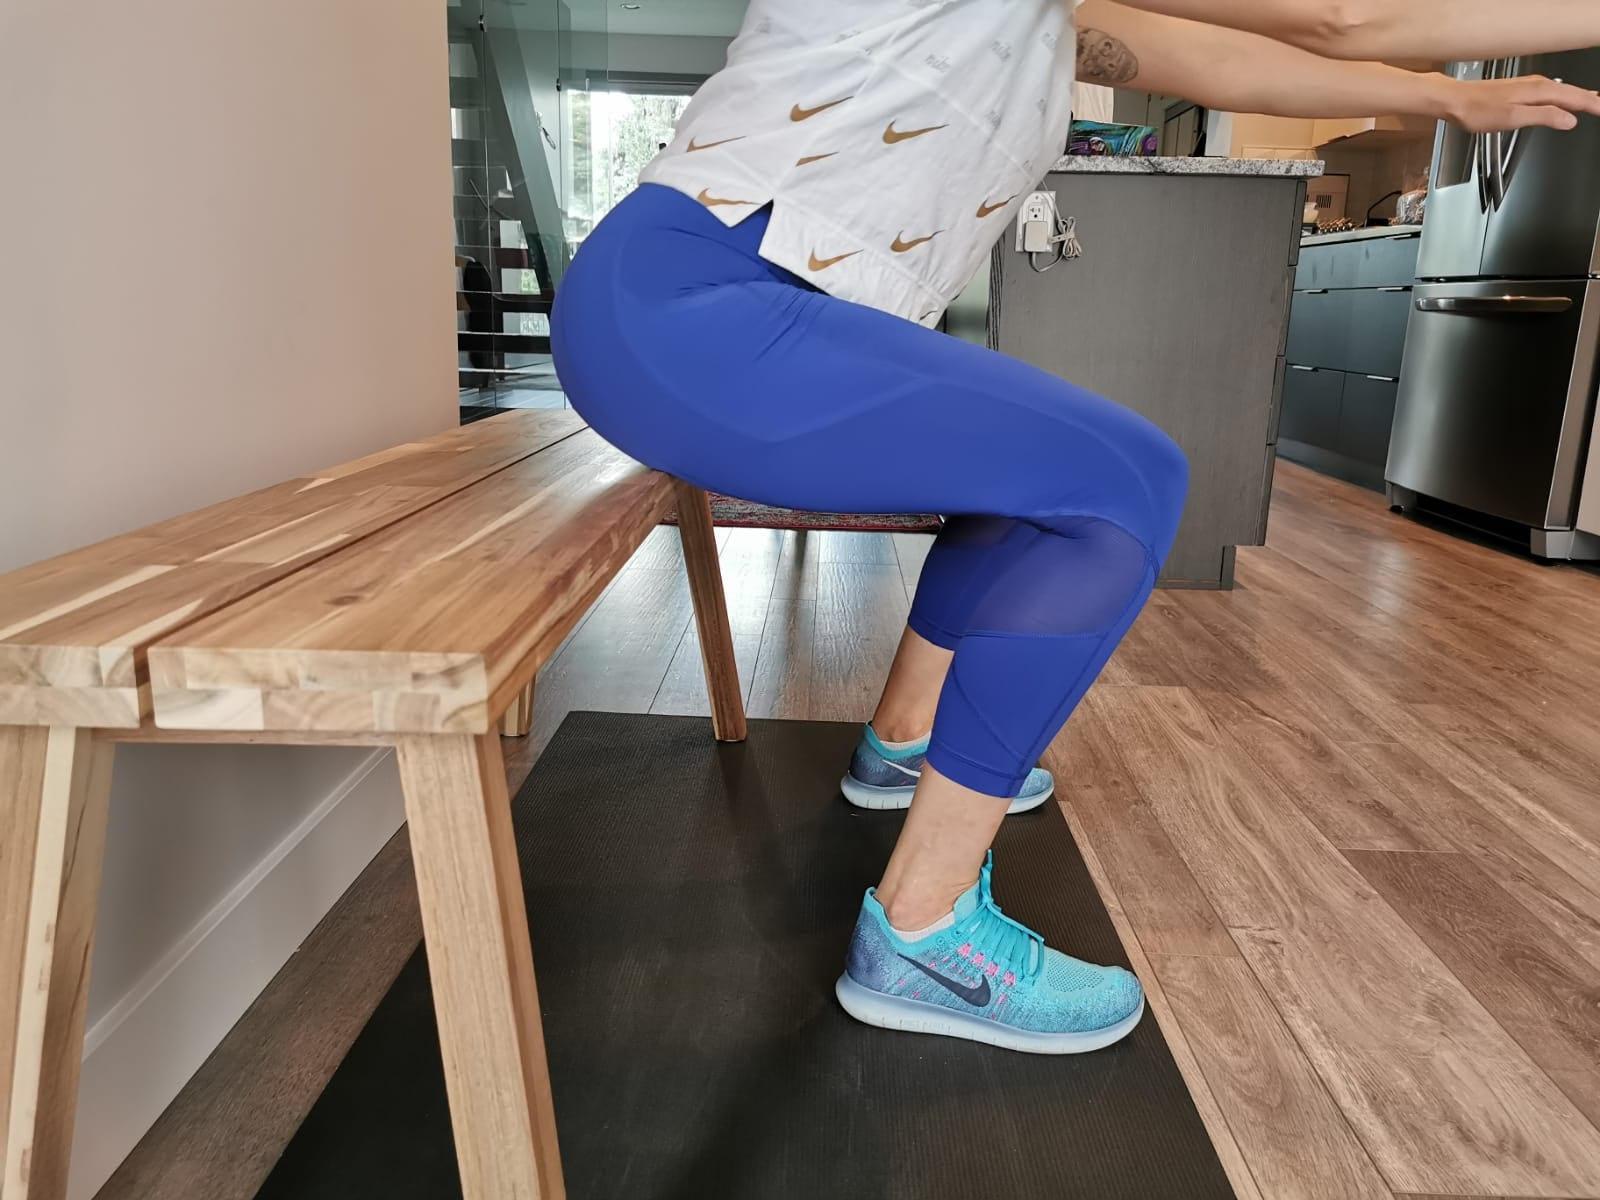 Bench Squats - Squat Better